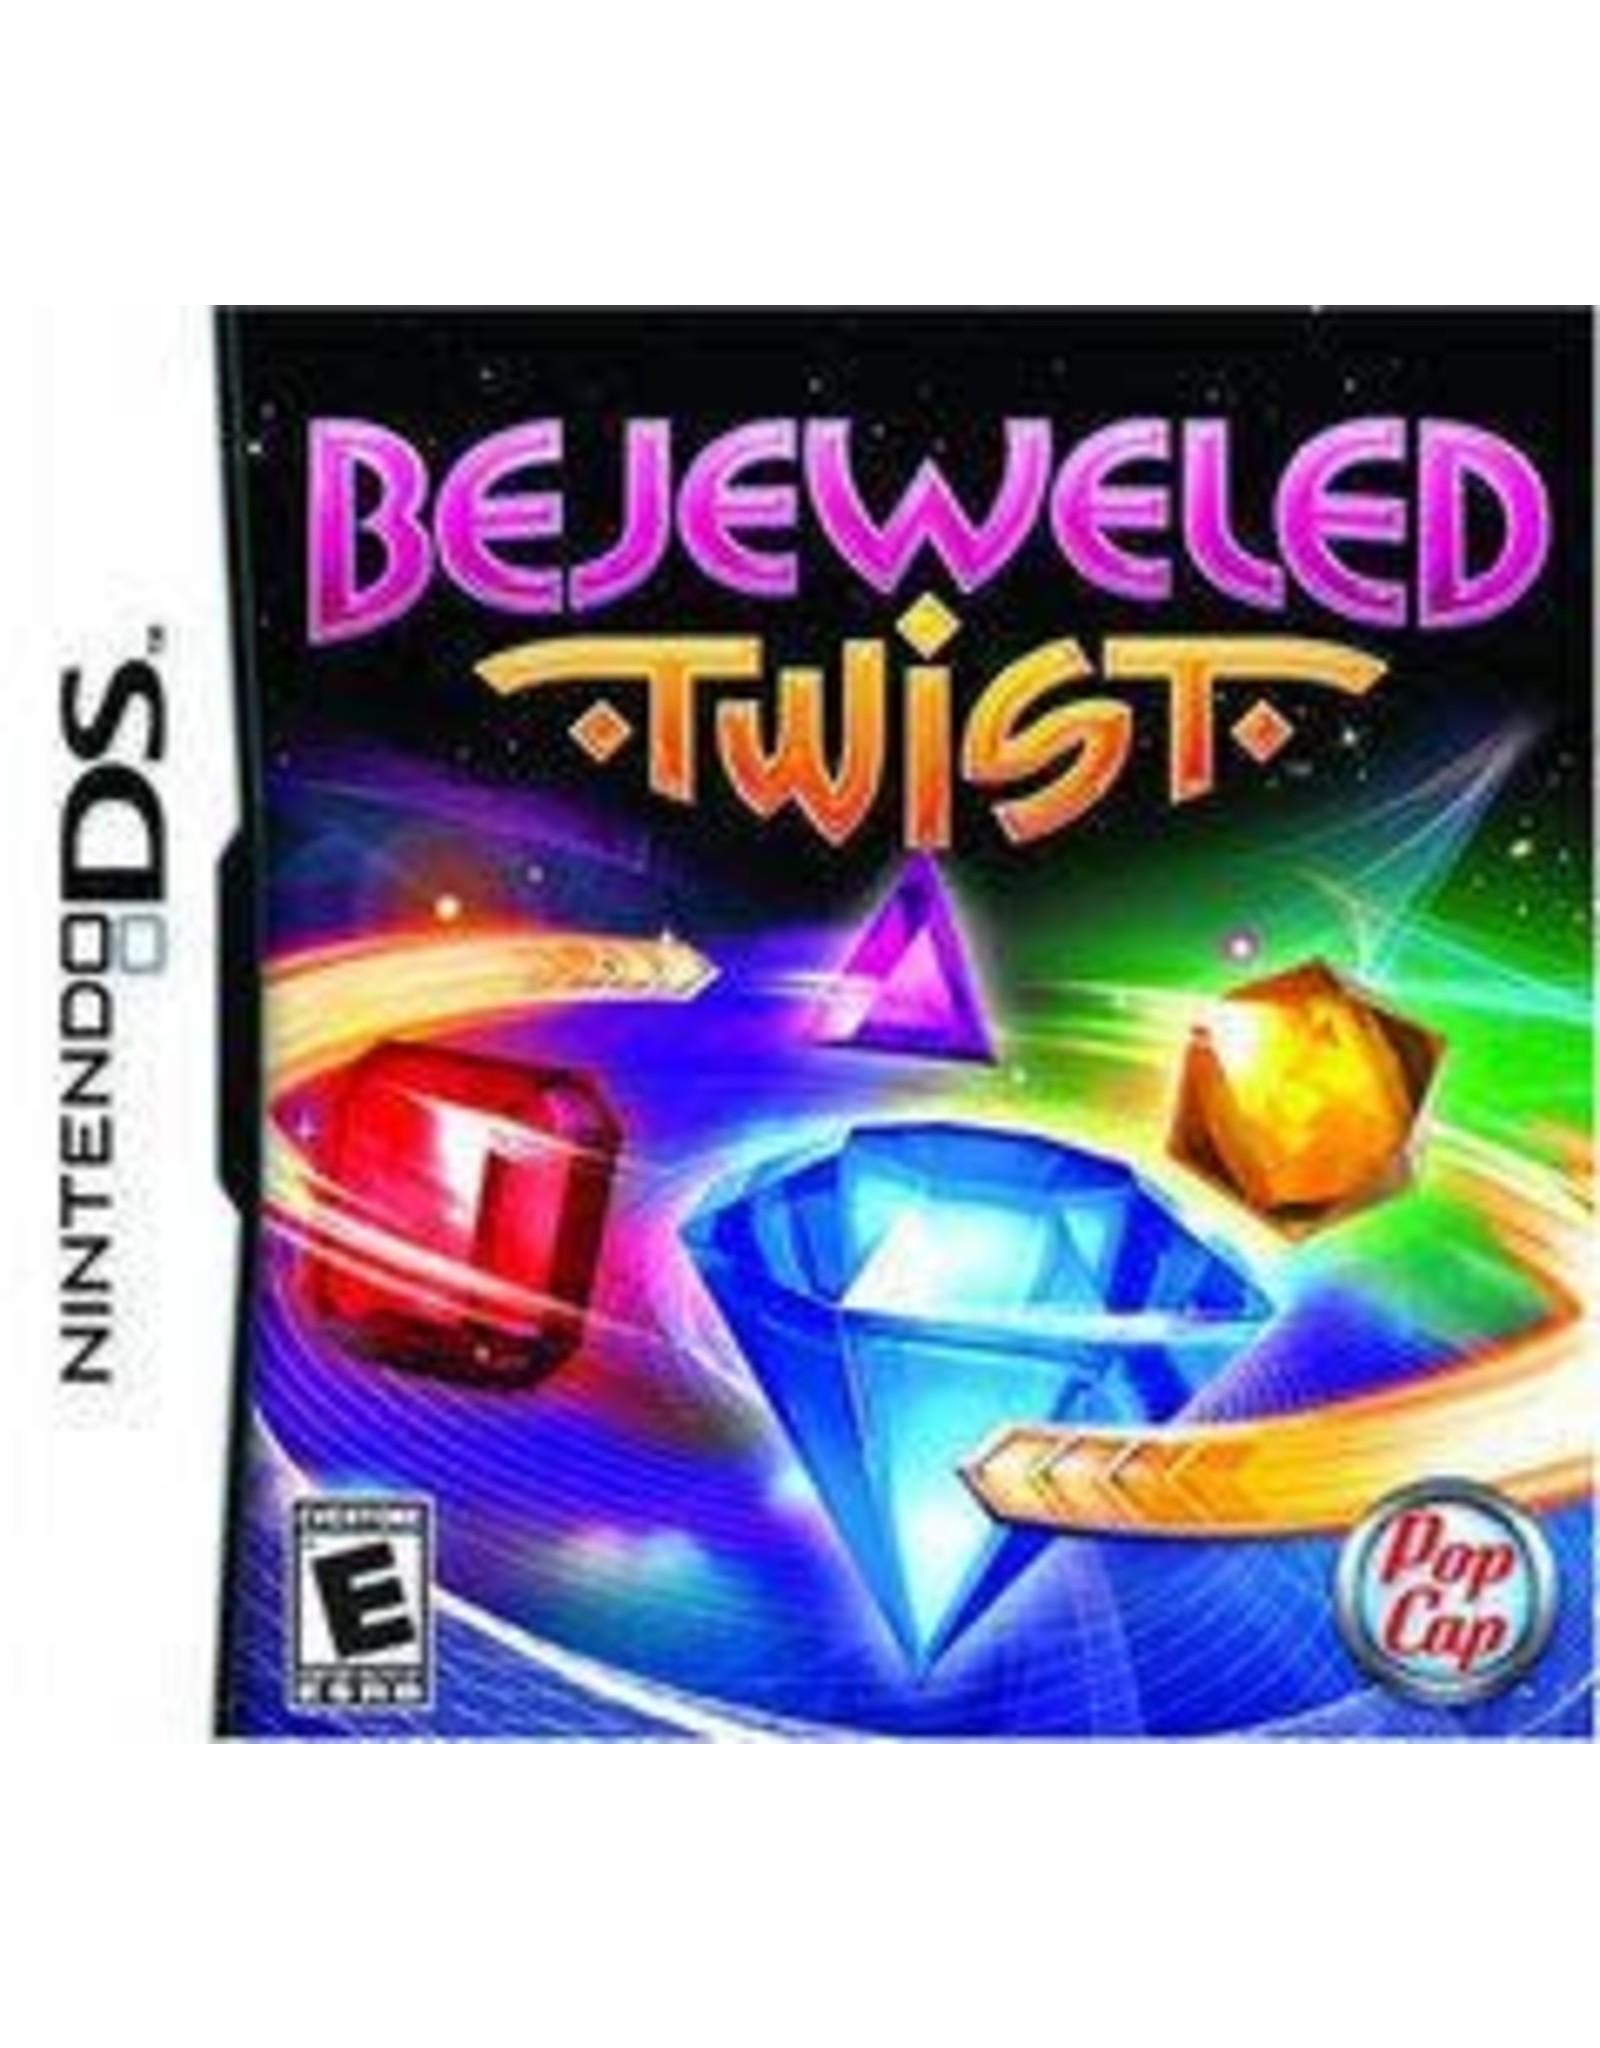 Nintendo DS Bejeweled Twist